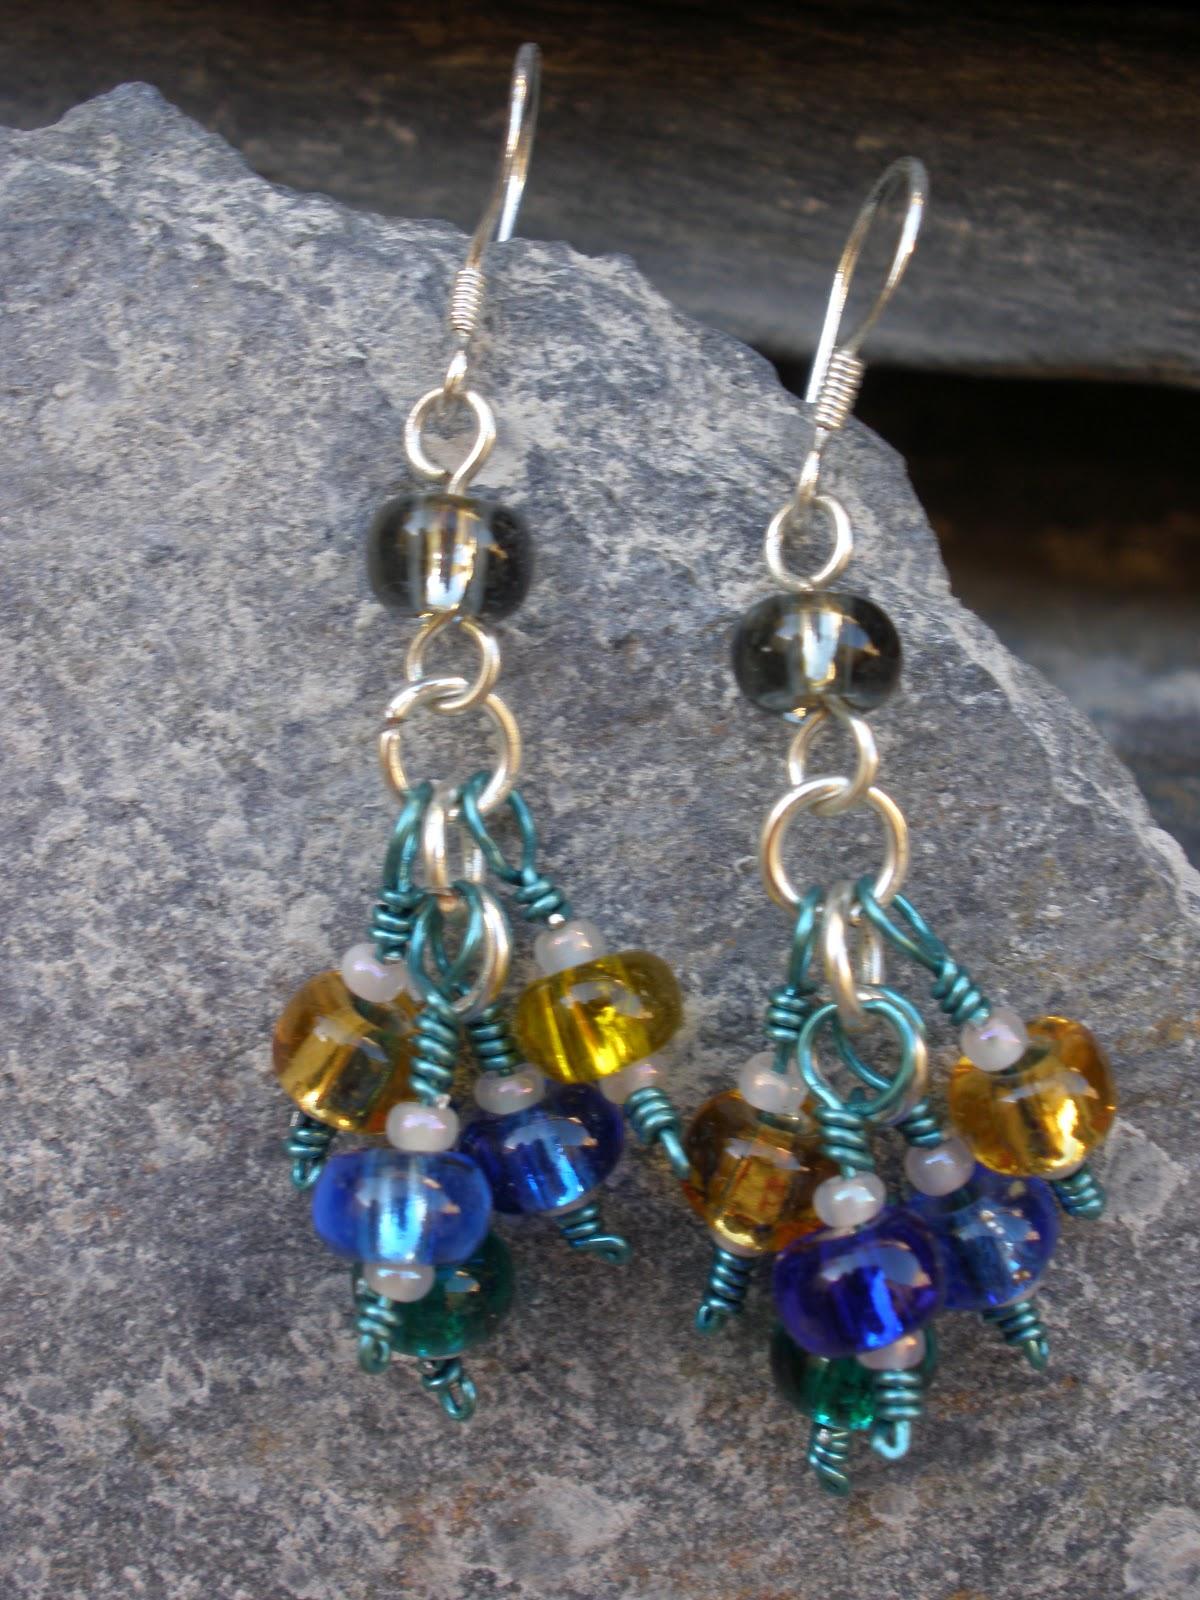 Chloe Louise Handmade Jewellery: Earrings - a bunch of my handmade ...